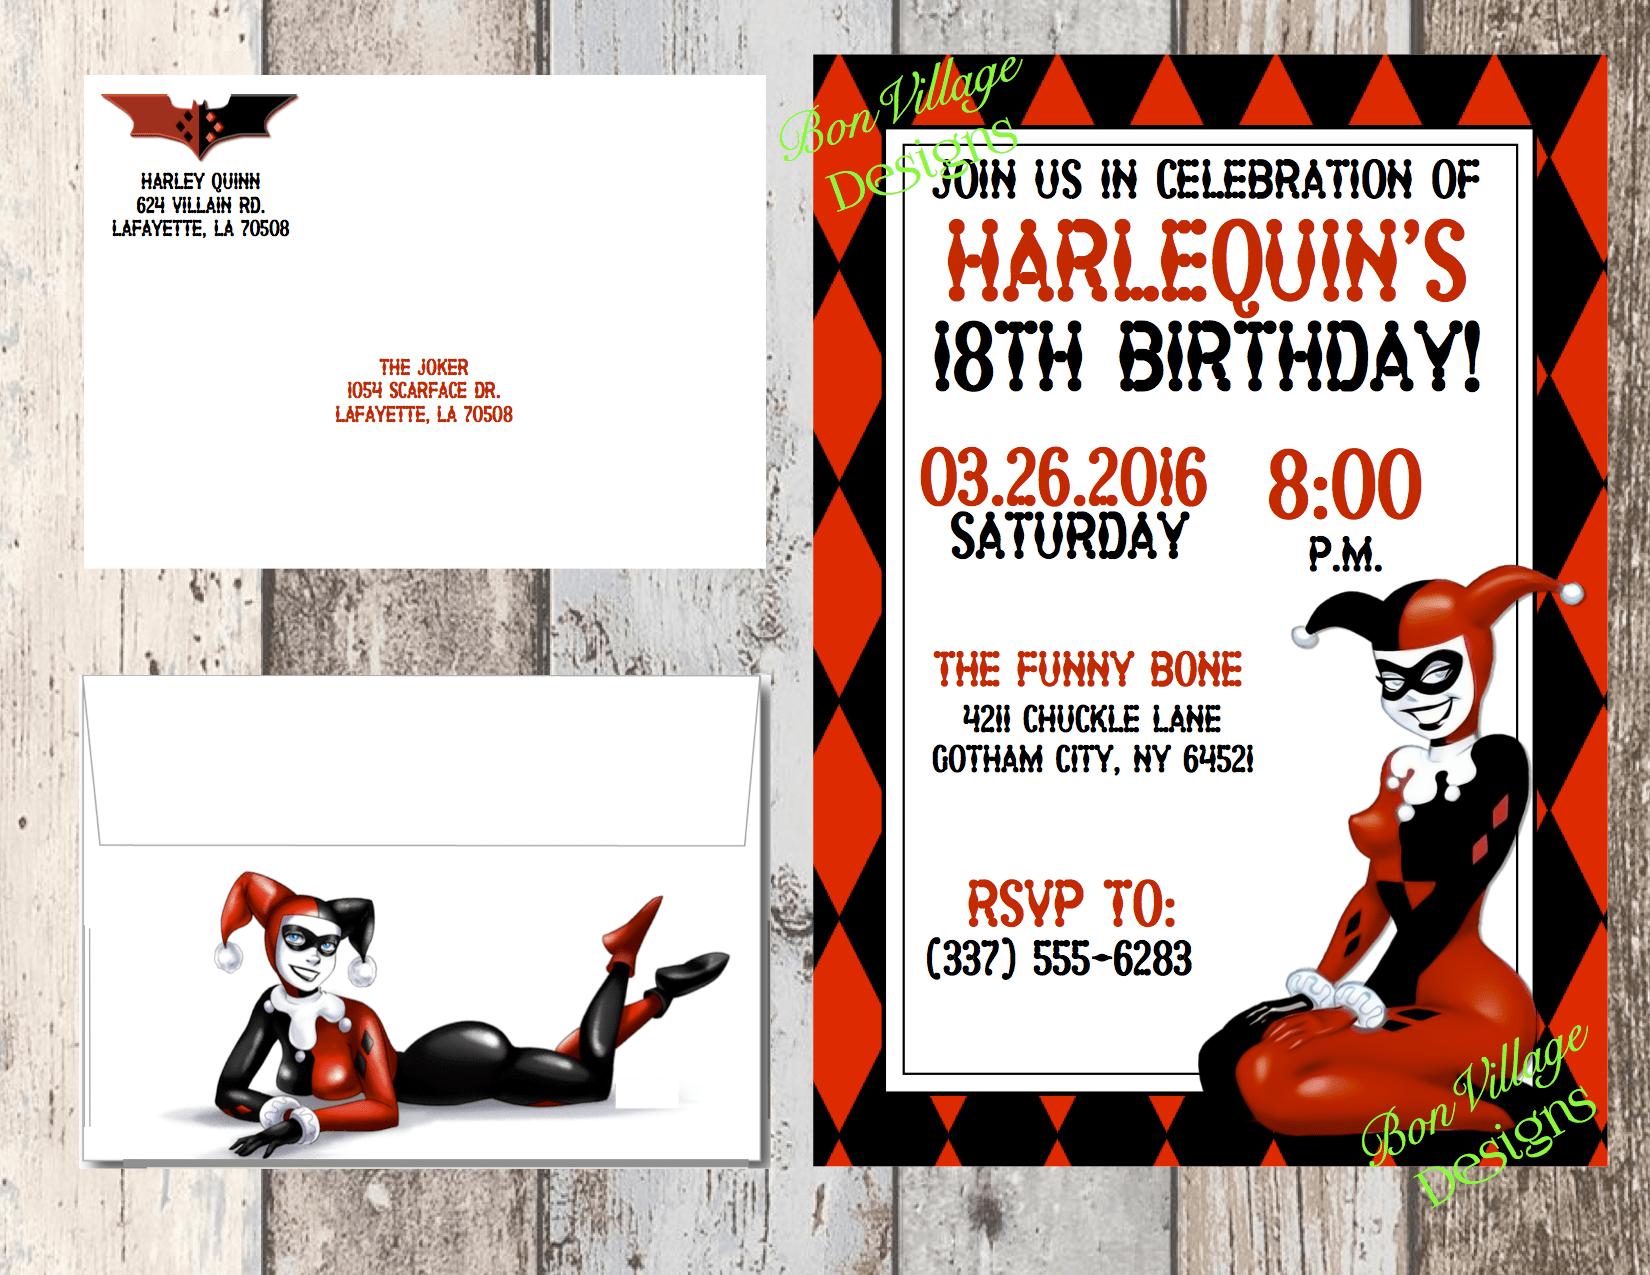 Harley Quinn Free Invitations